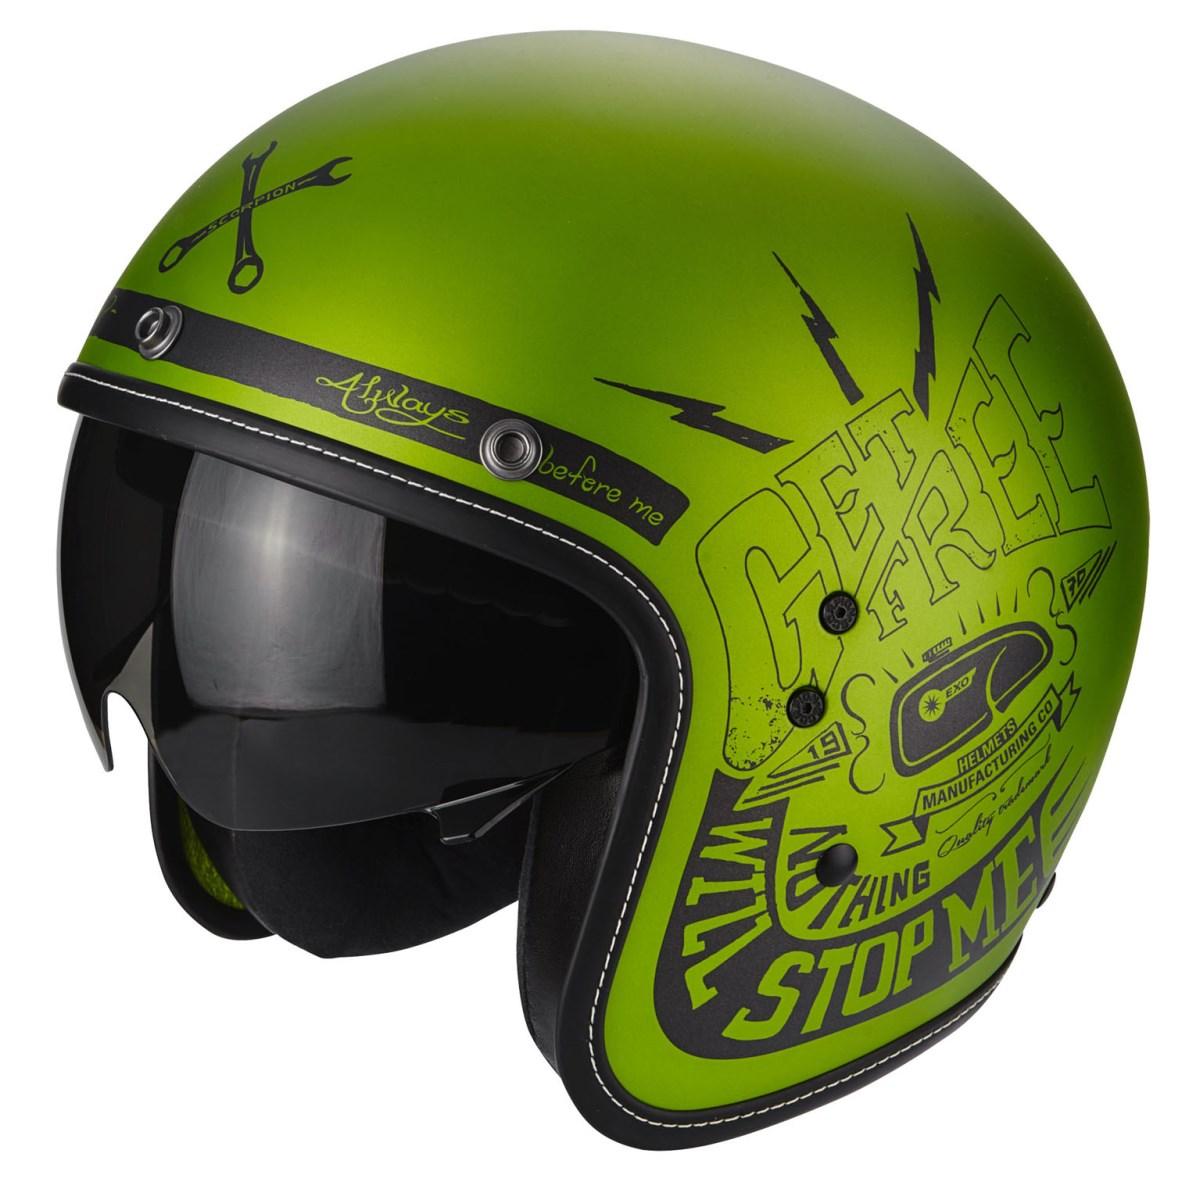 Motori360_SCORPION - BELFAST FENDER green